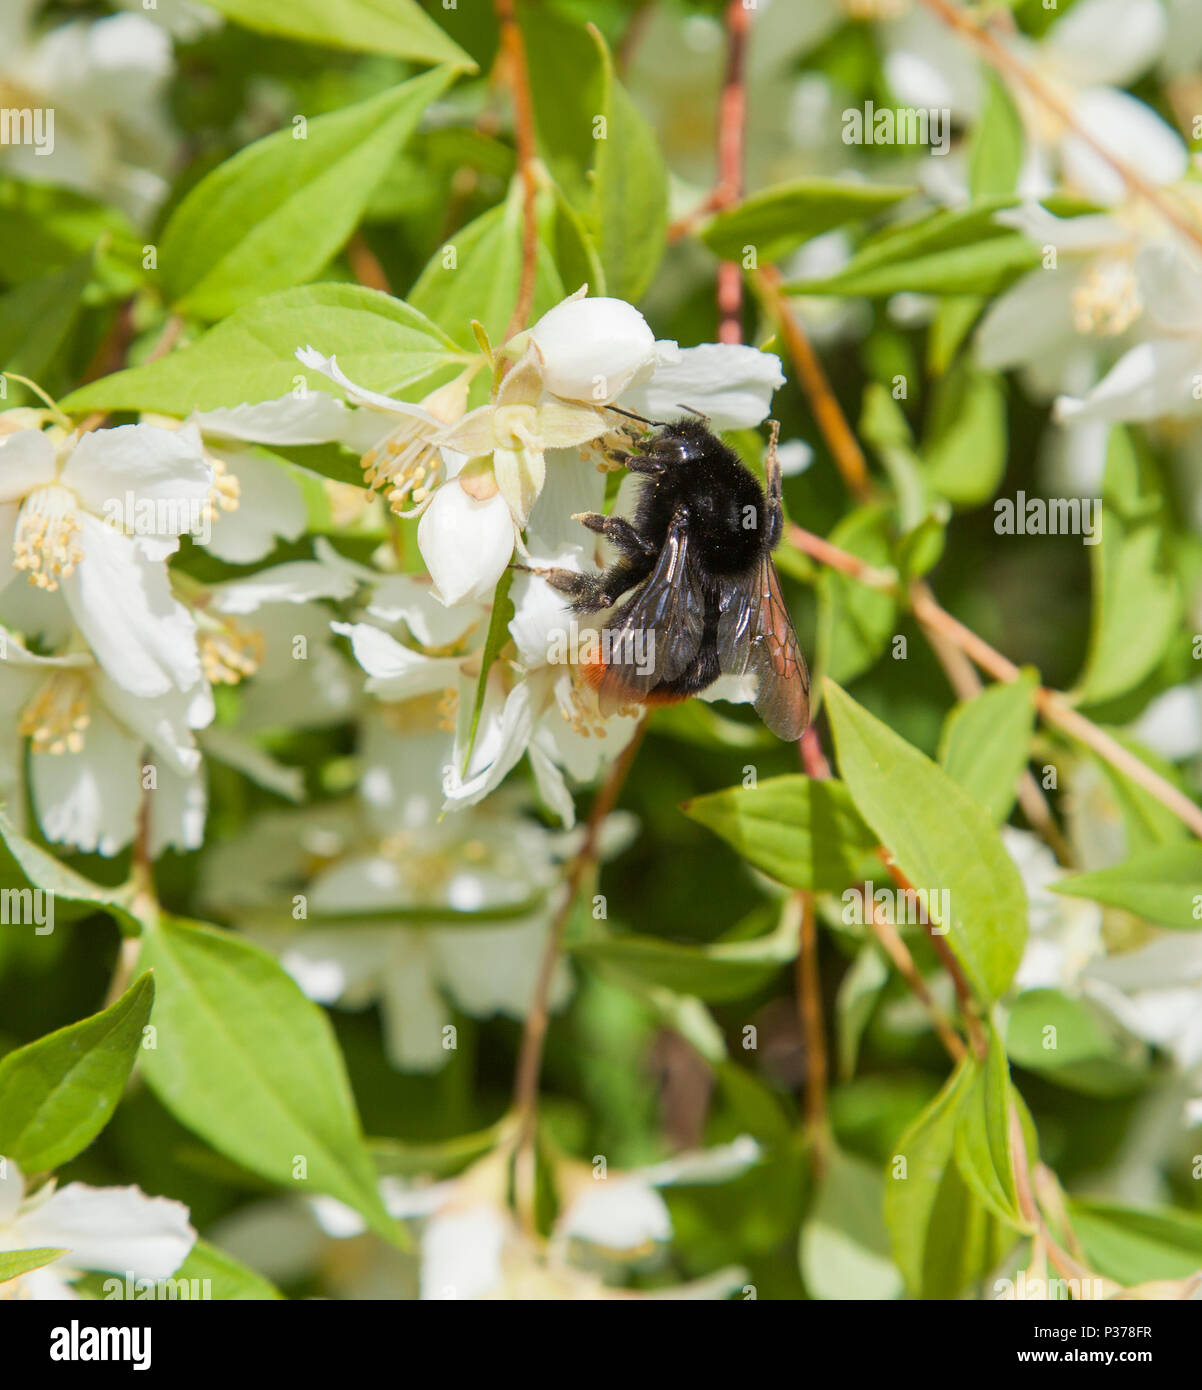 BUMBLEBEE at Jasmine 2018 - Stock Image